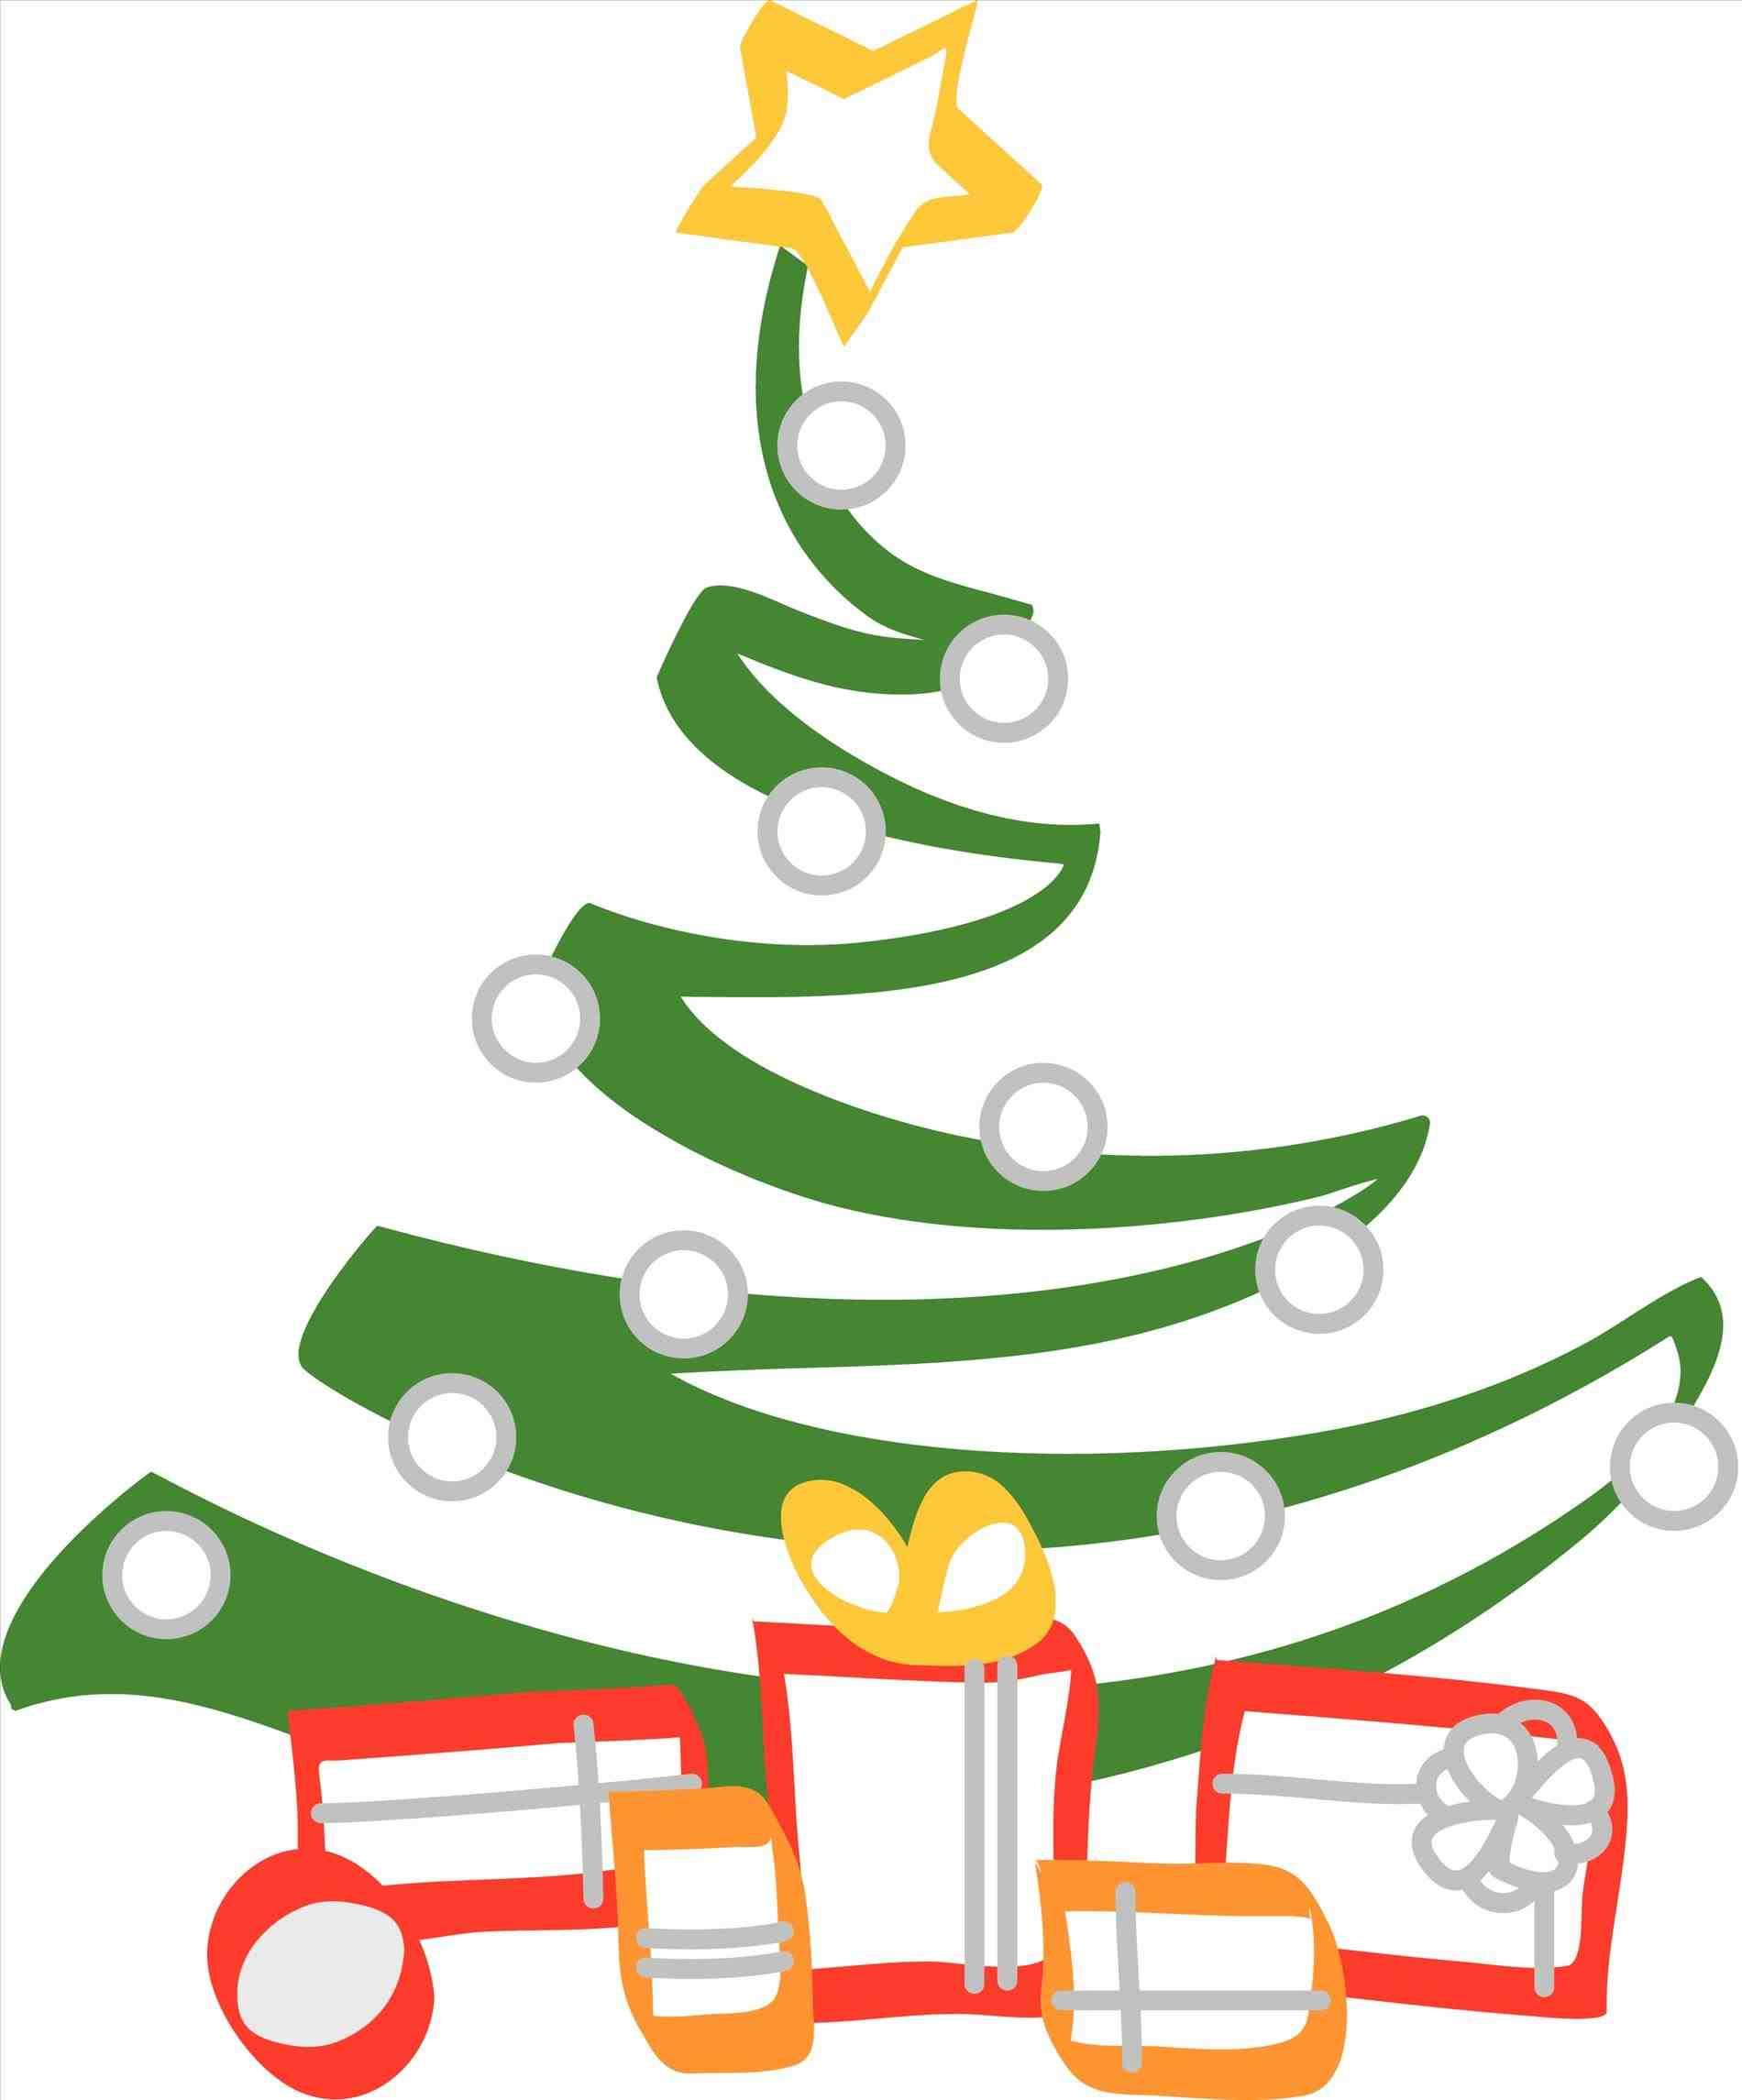 1900x2291 Classy Christmas Tree Clip Art Cheminee.website